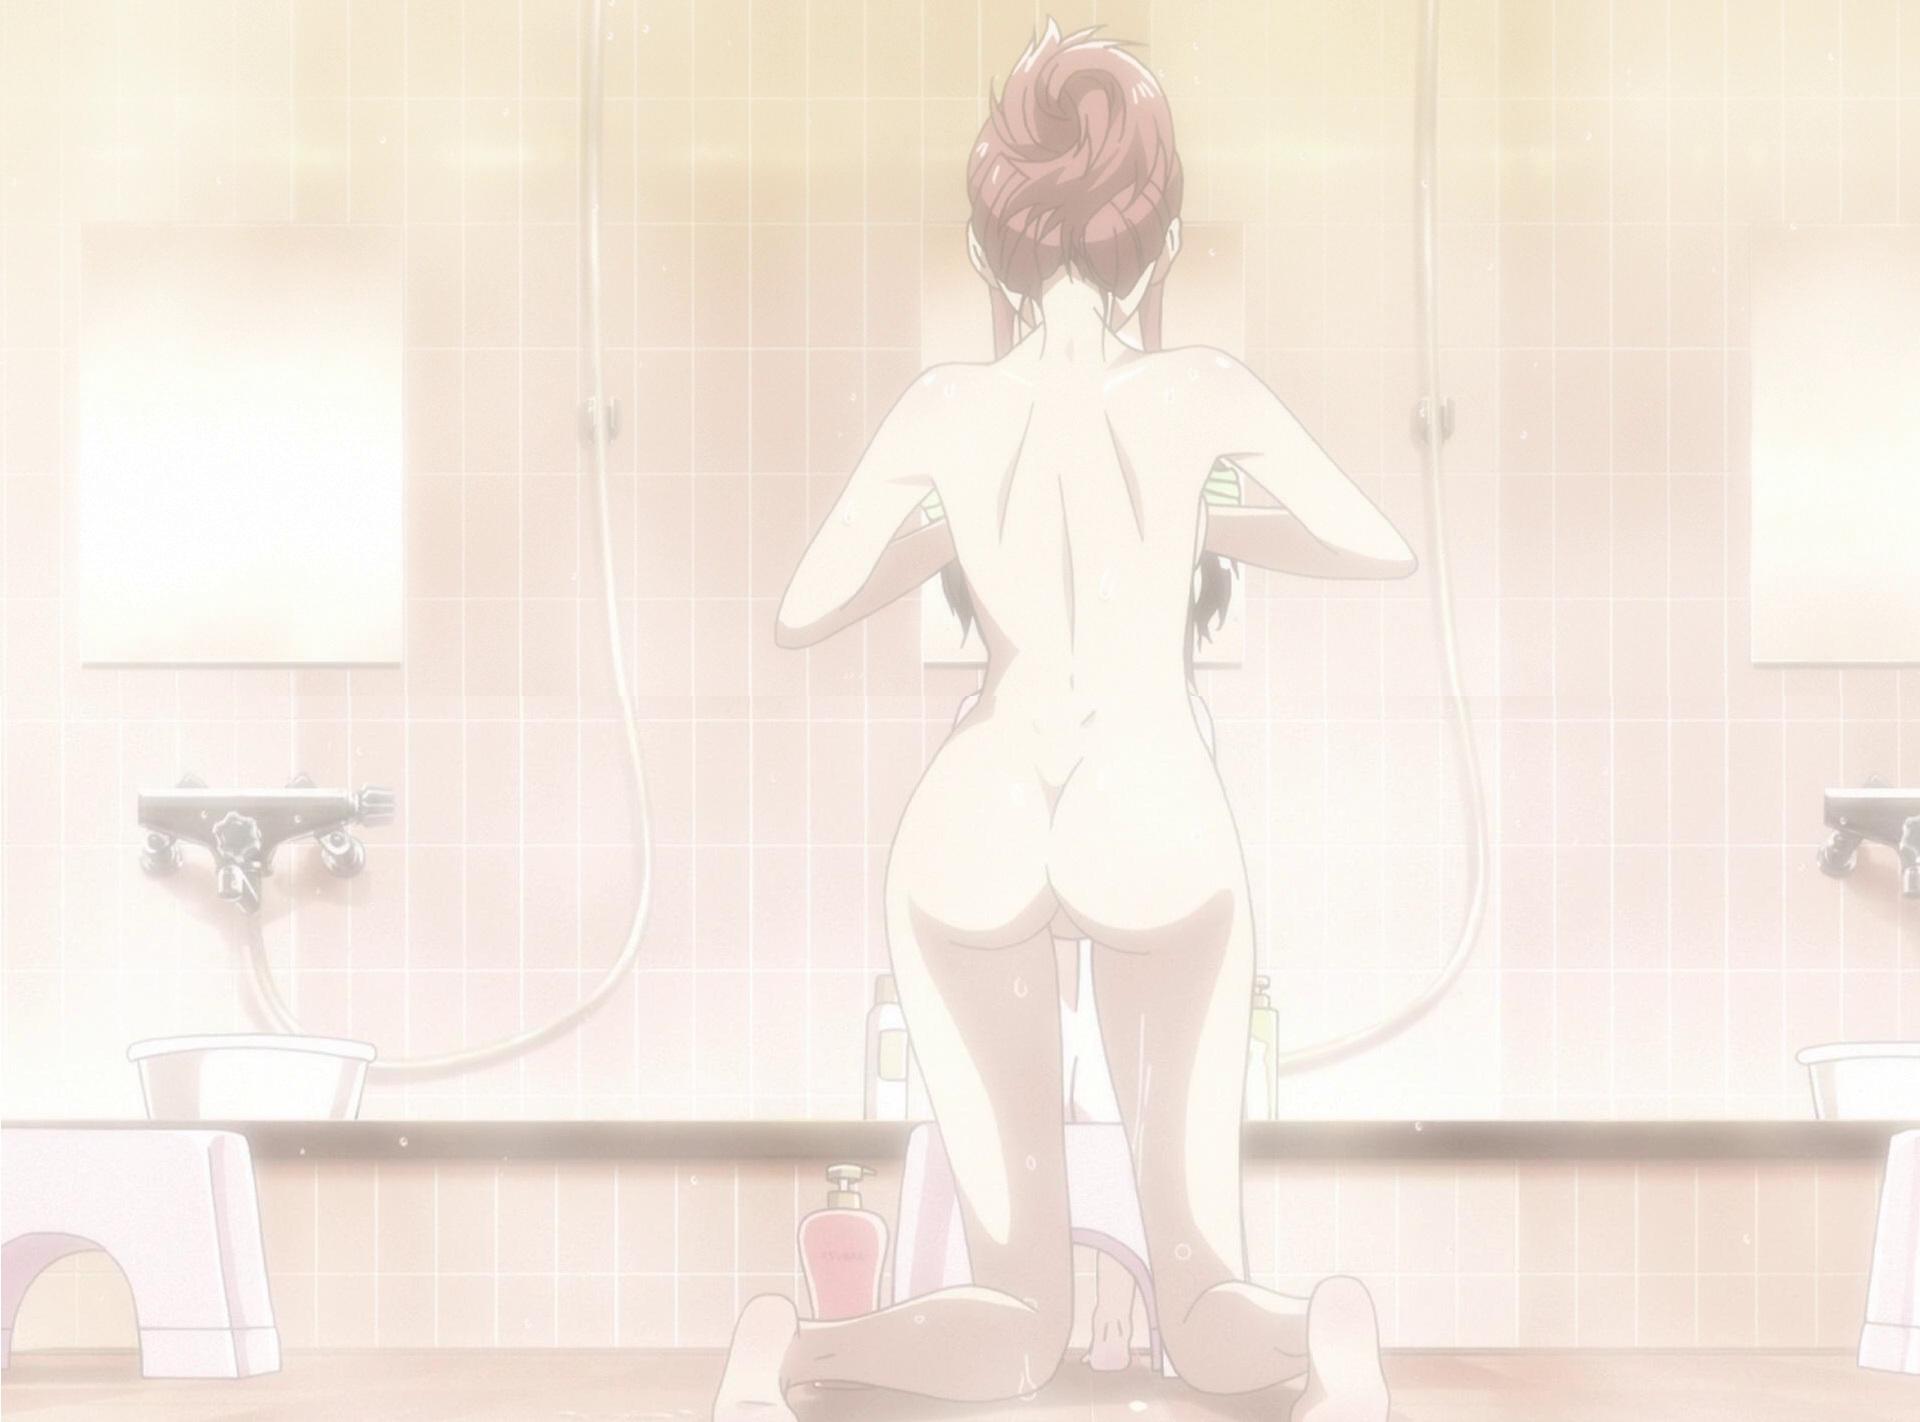 Hot anime girl dress up games